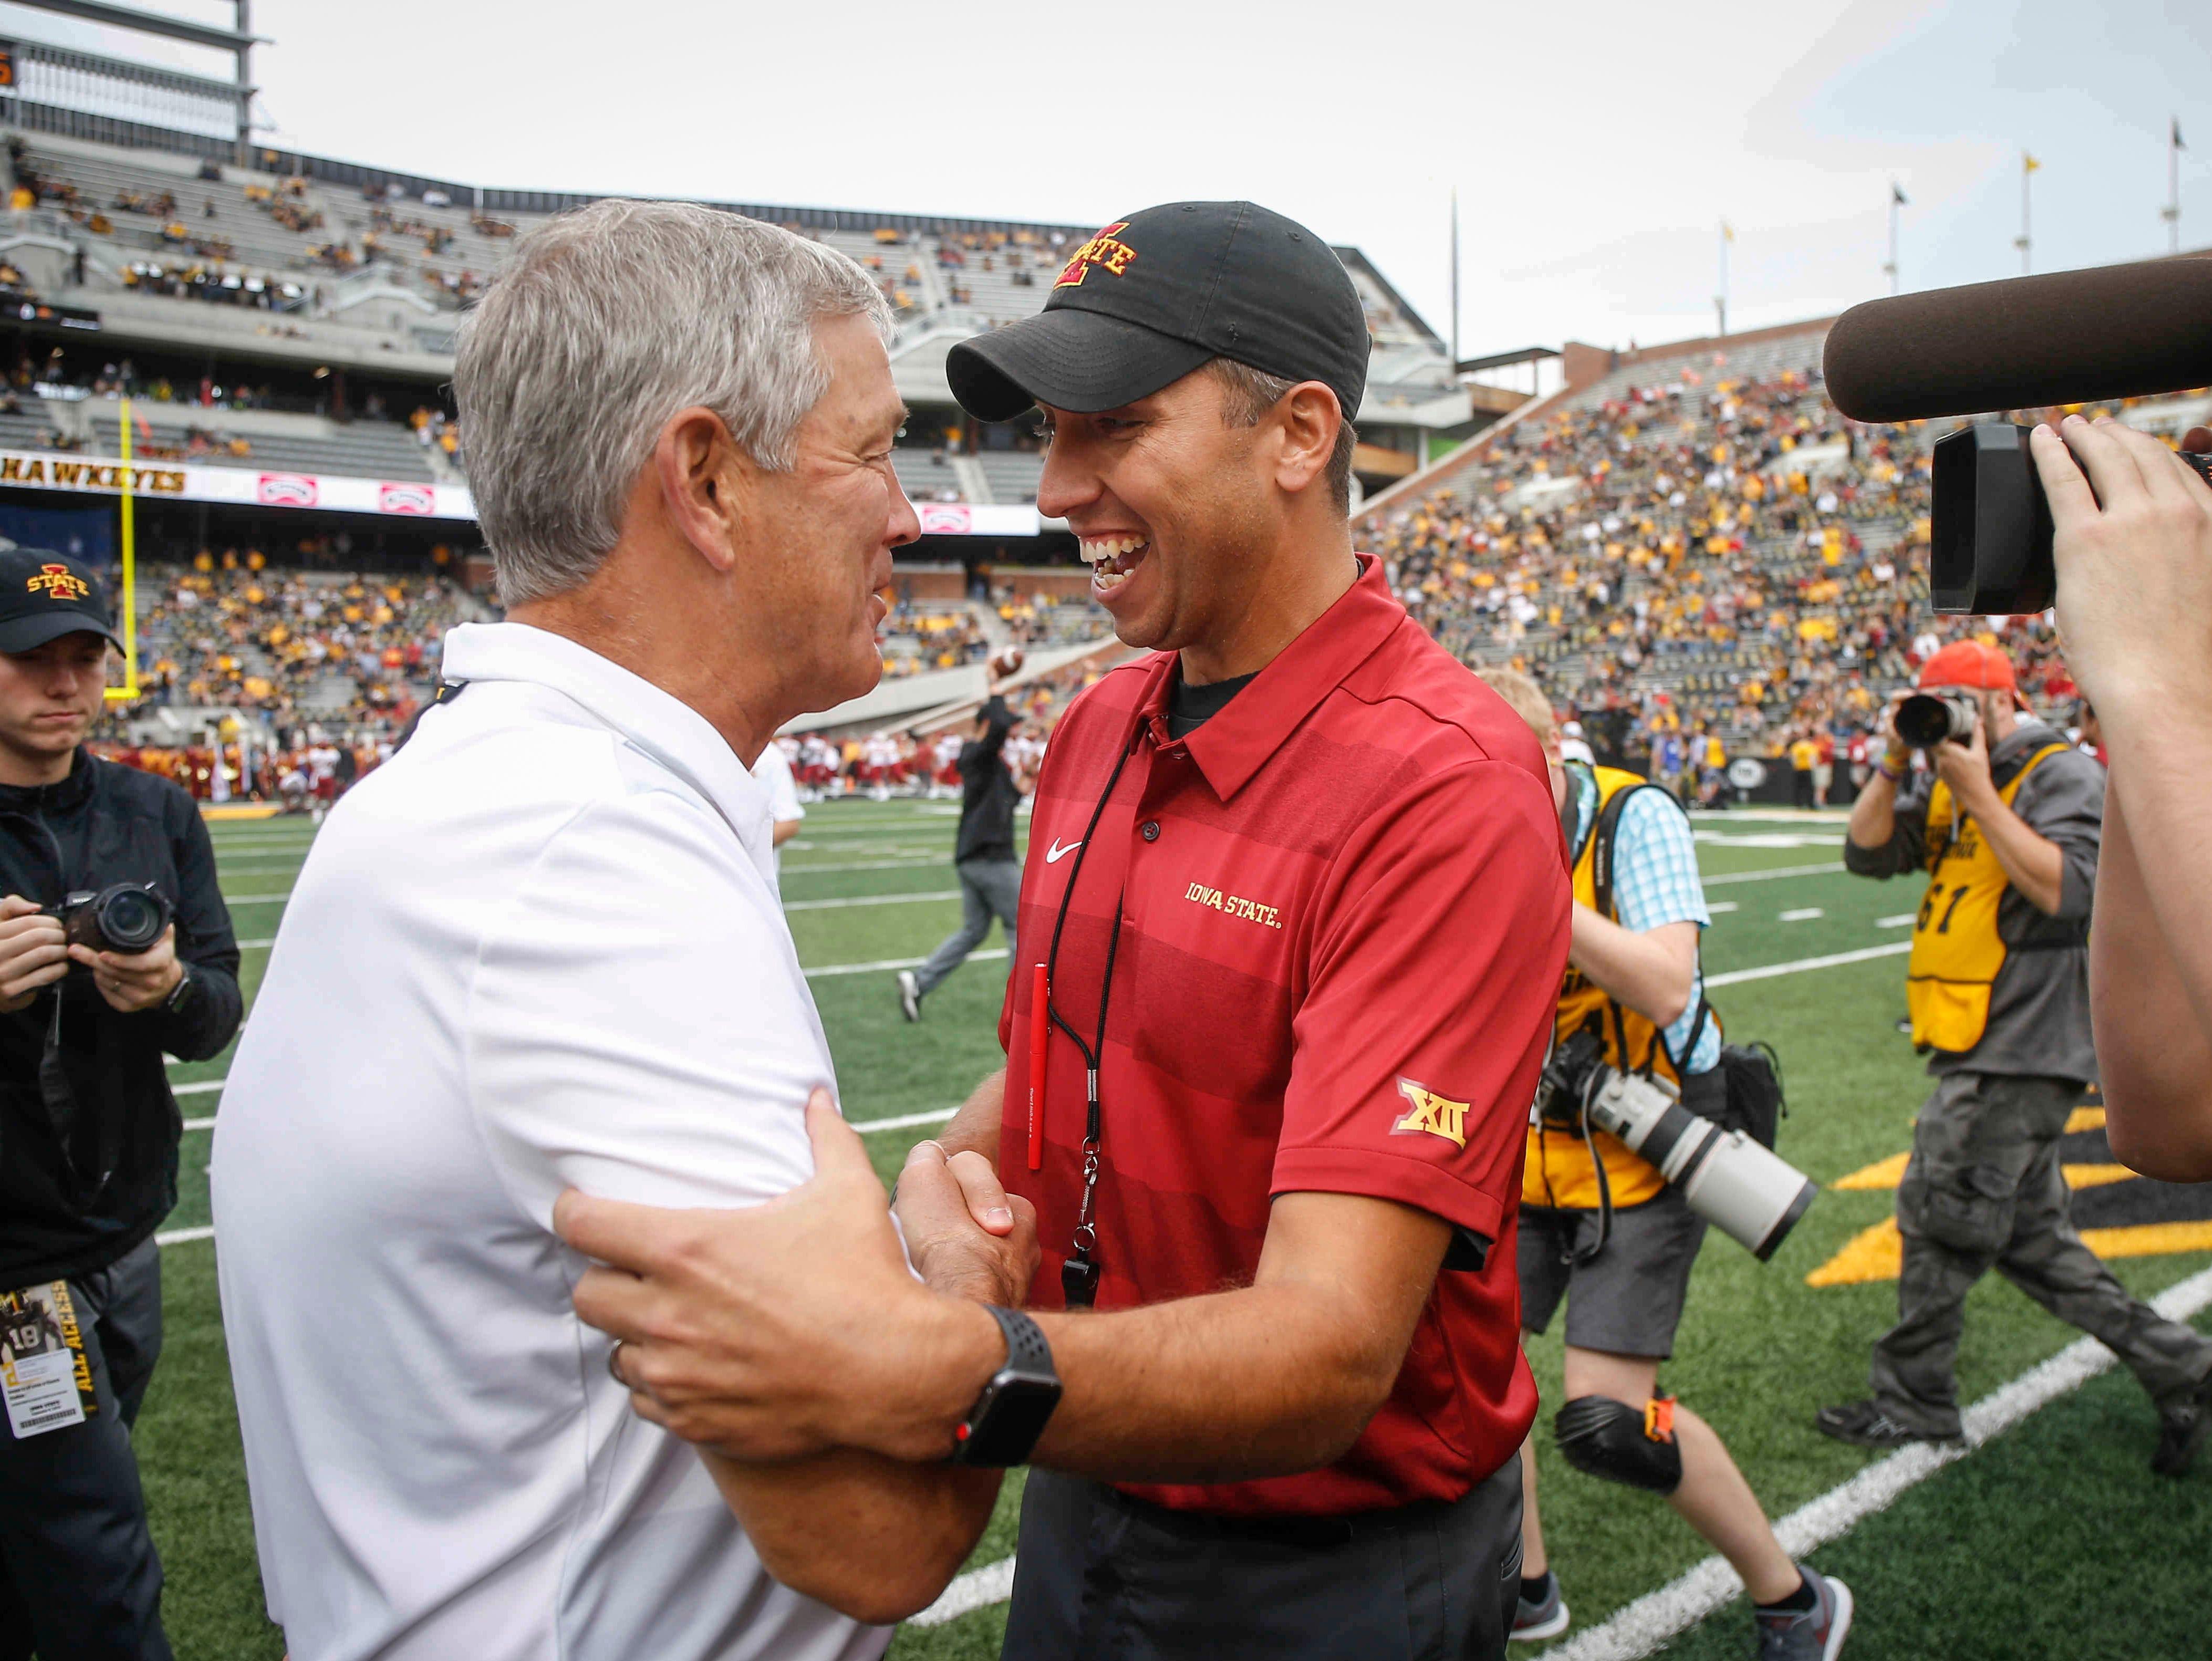 Iowa head football coach Kirk Ferentz, left, meets with Iowa State head football coach Matt Campbell prior to kickoff on Saturday, Sept. 8, 2018, at Kinnick Stadium in Iowa City.